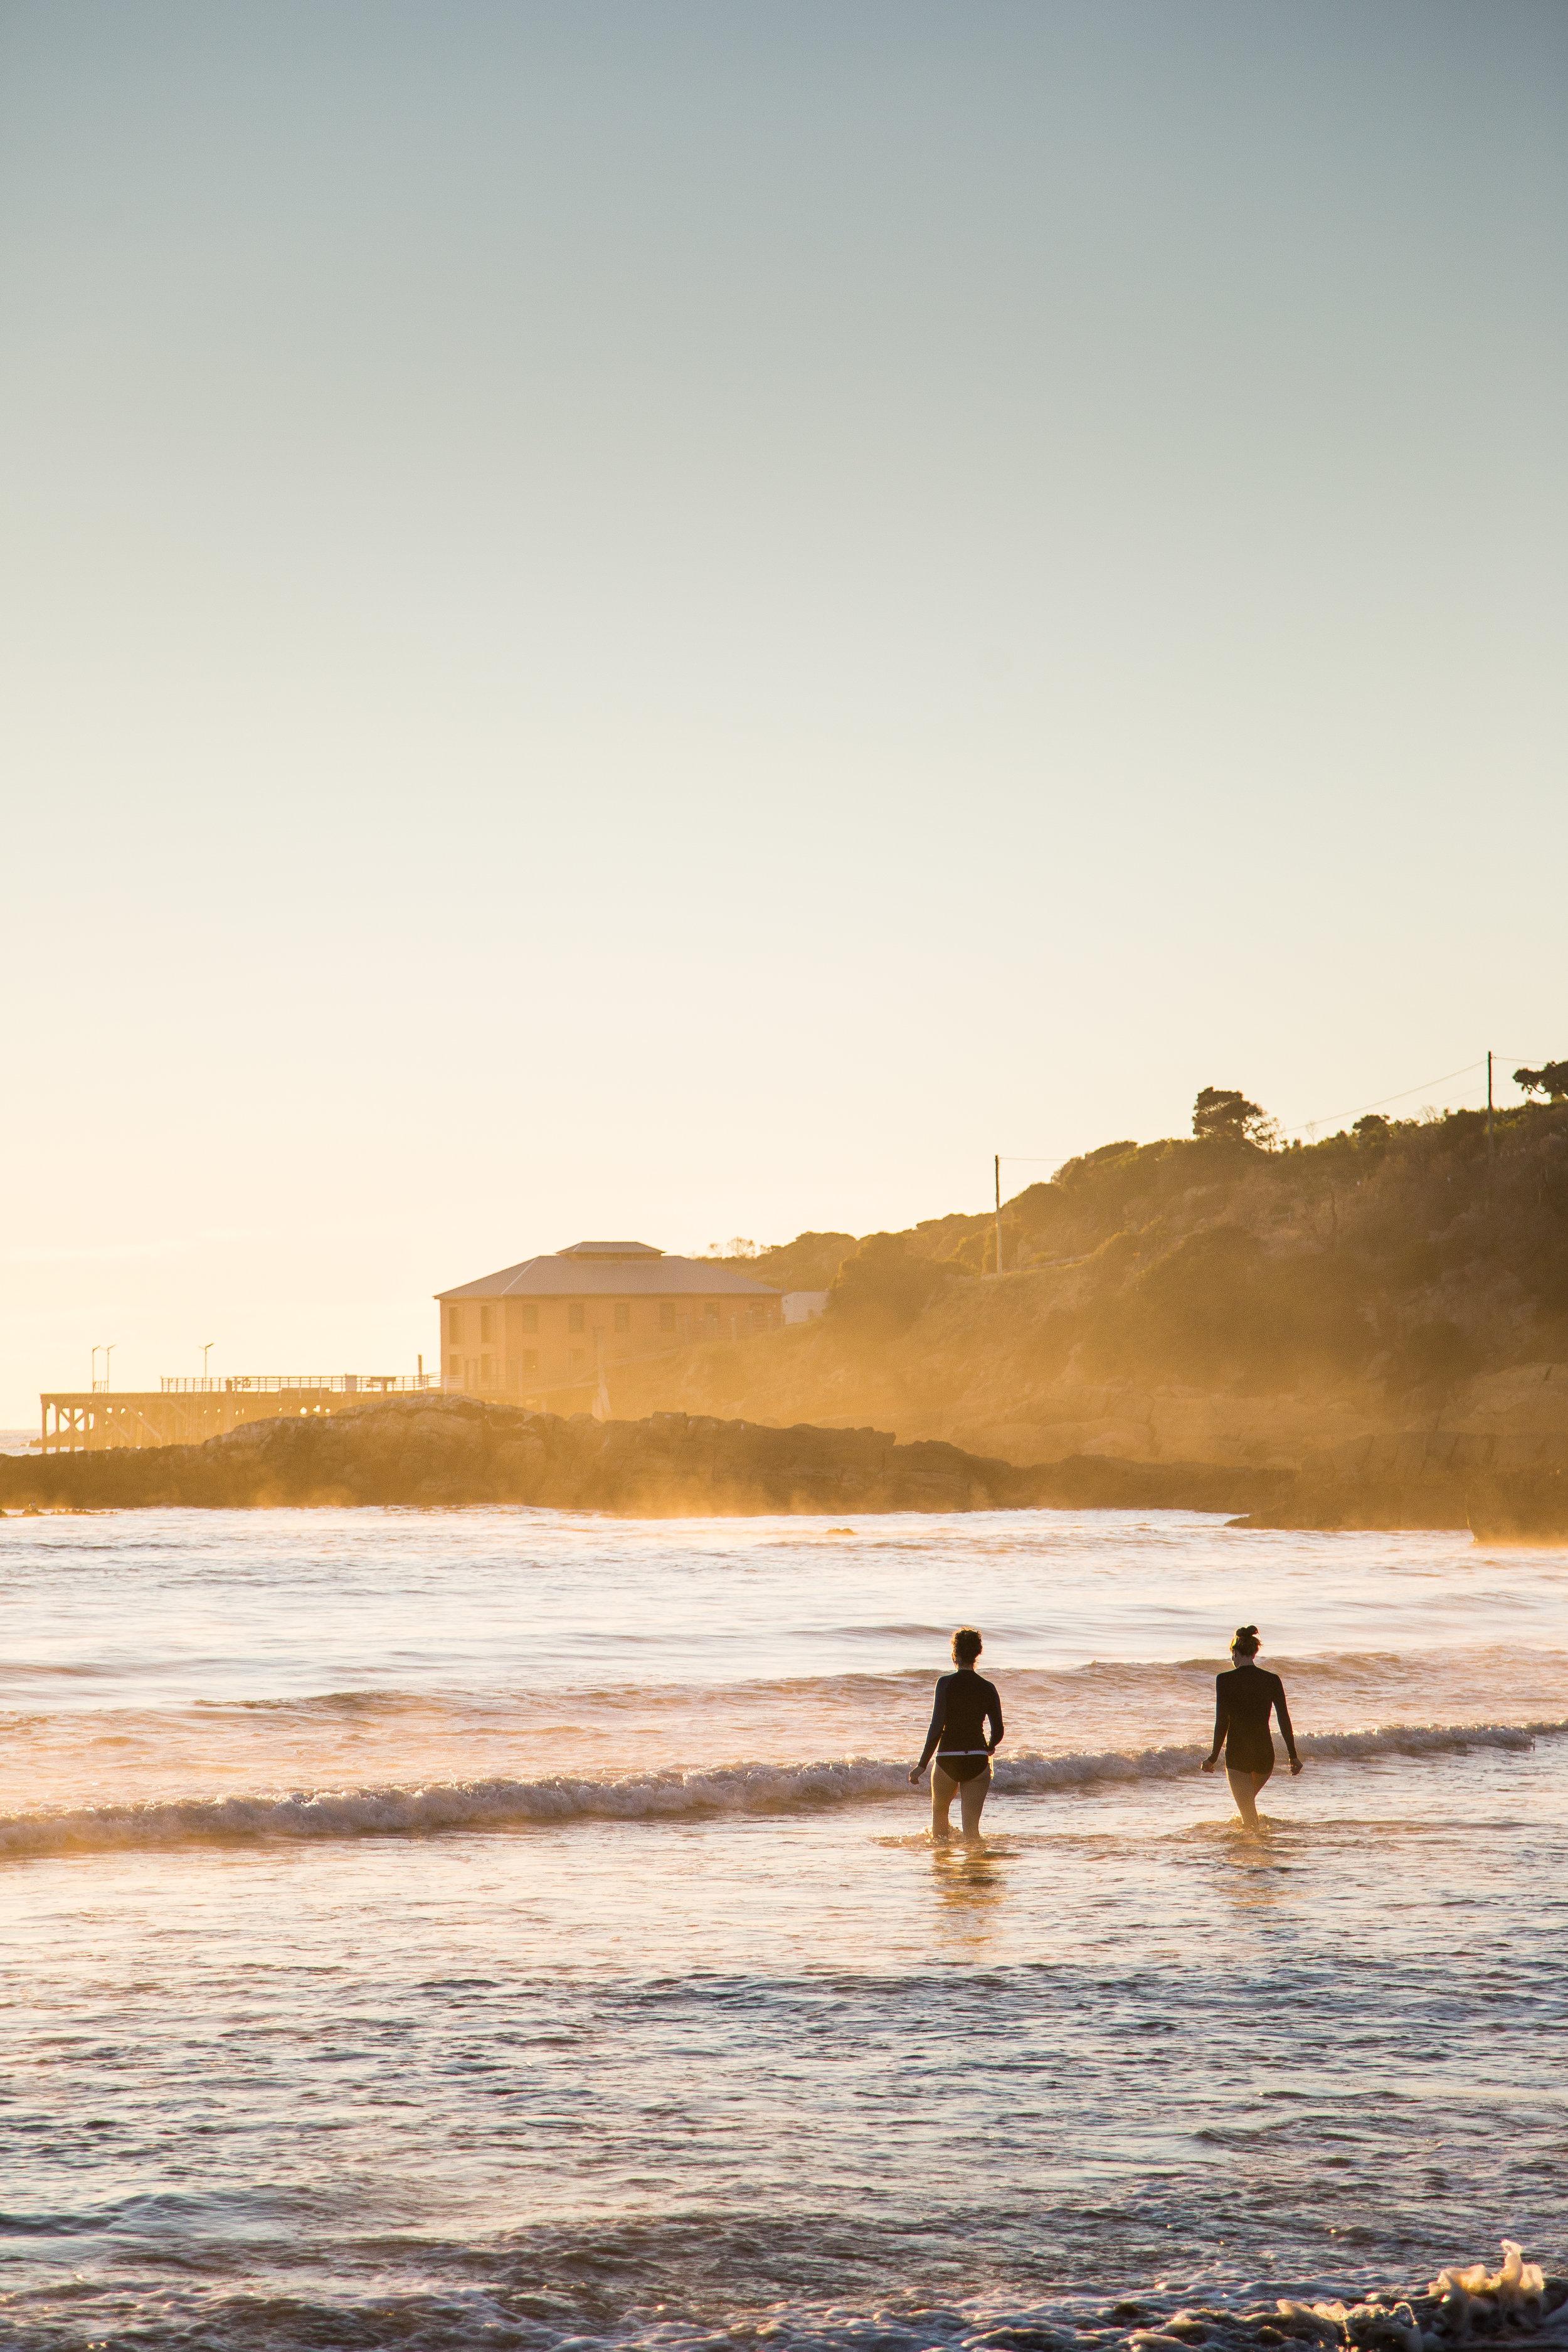 Tathra Beach - Destination NSW